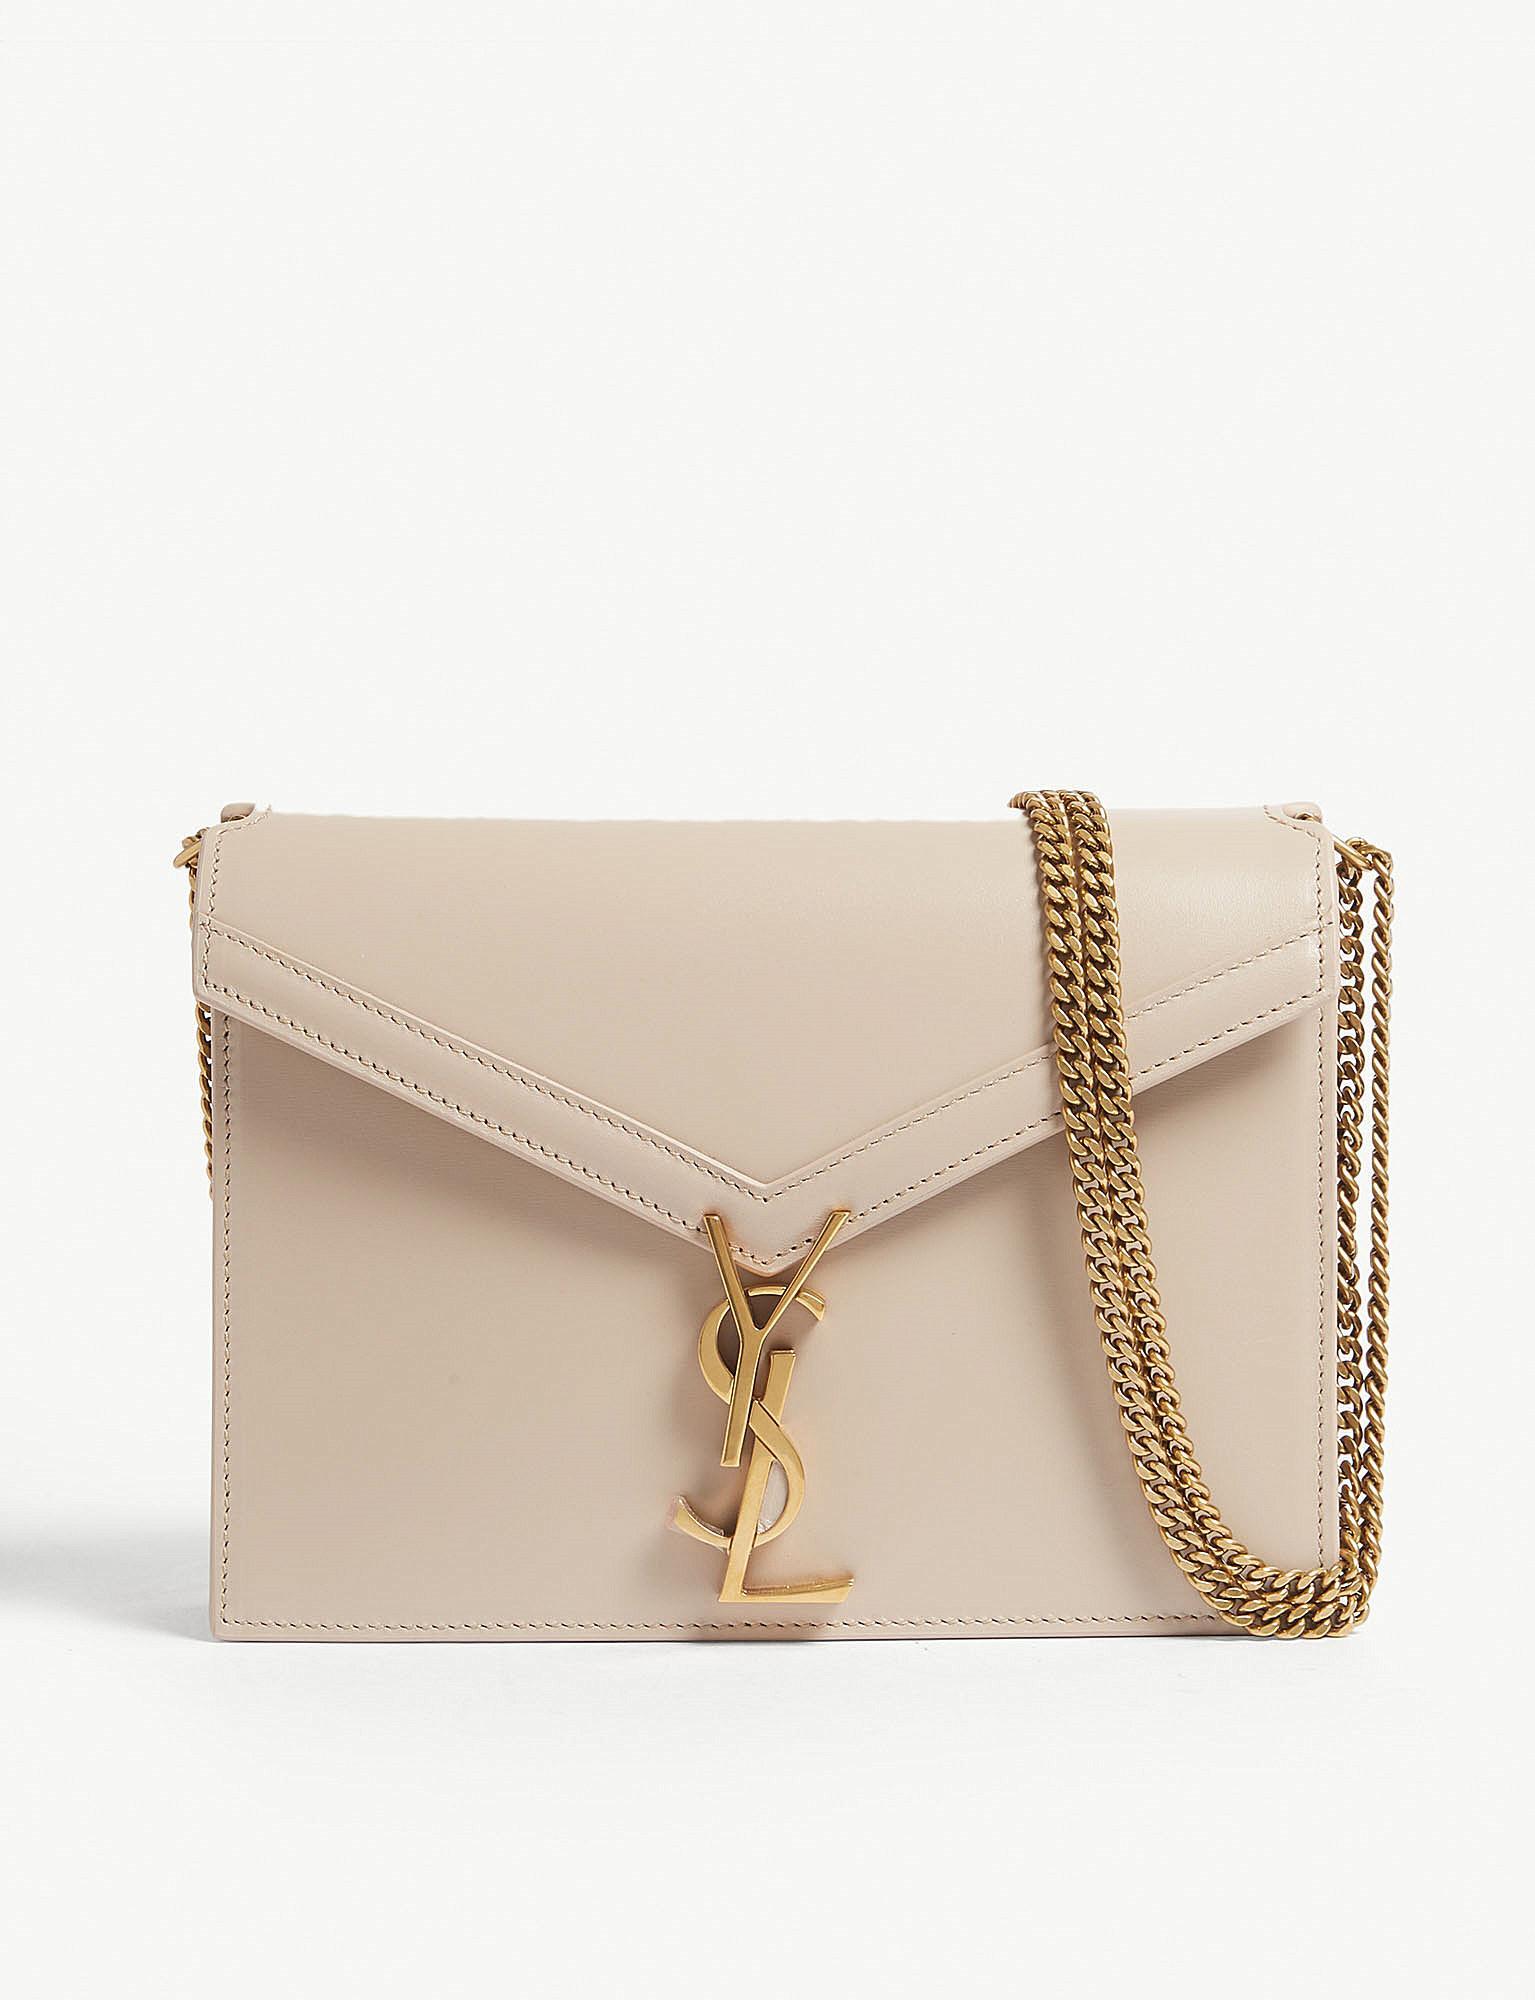 Lyst - Saint Laurent Cassandra Monogram Leather Shoulder Bag in Natural 44c6a55ff8541